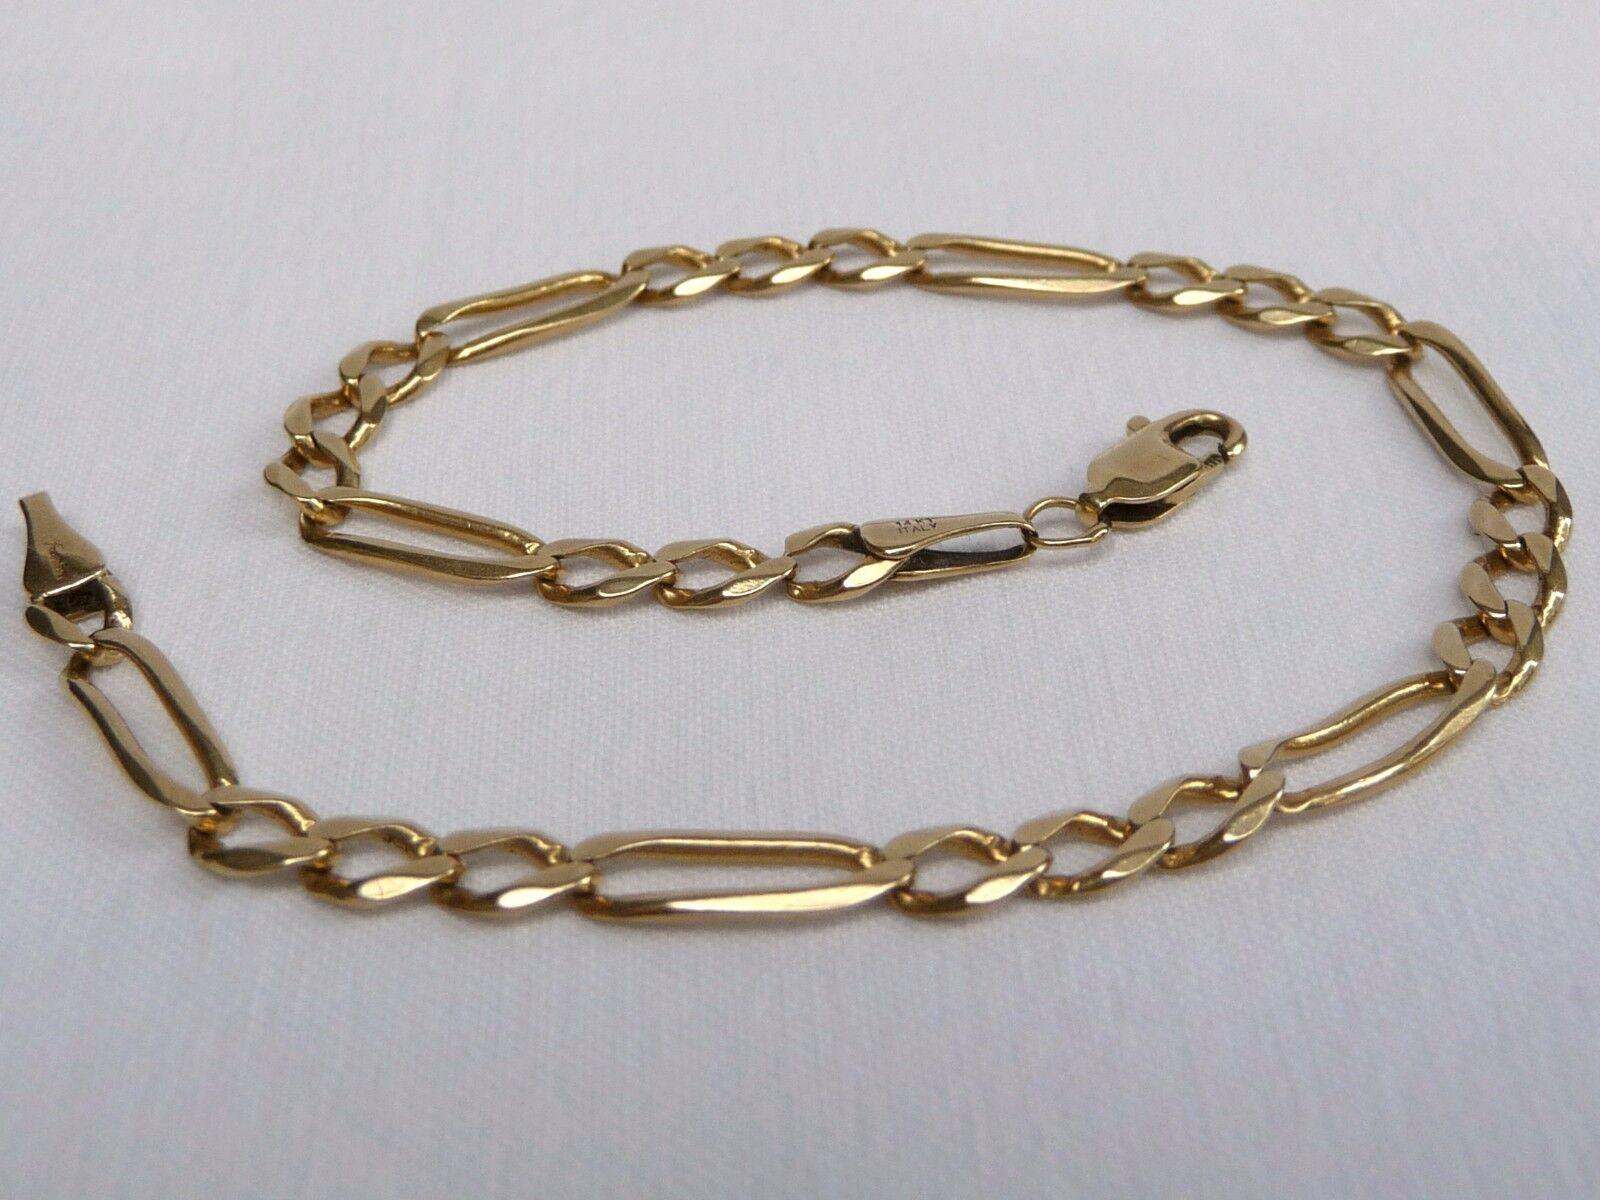 14k Solid Yellow Gold Aurafin Bracelet Figaro Link 8